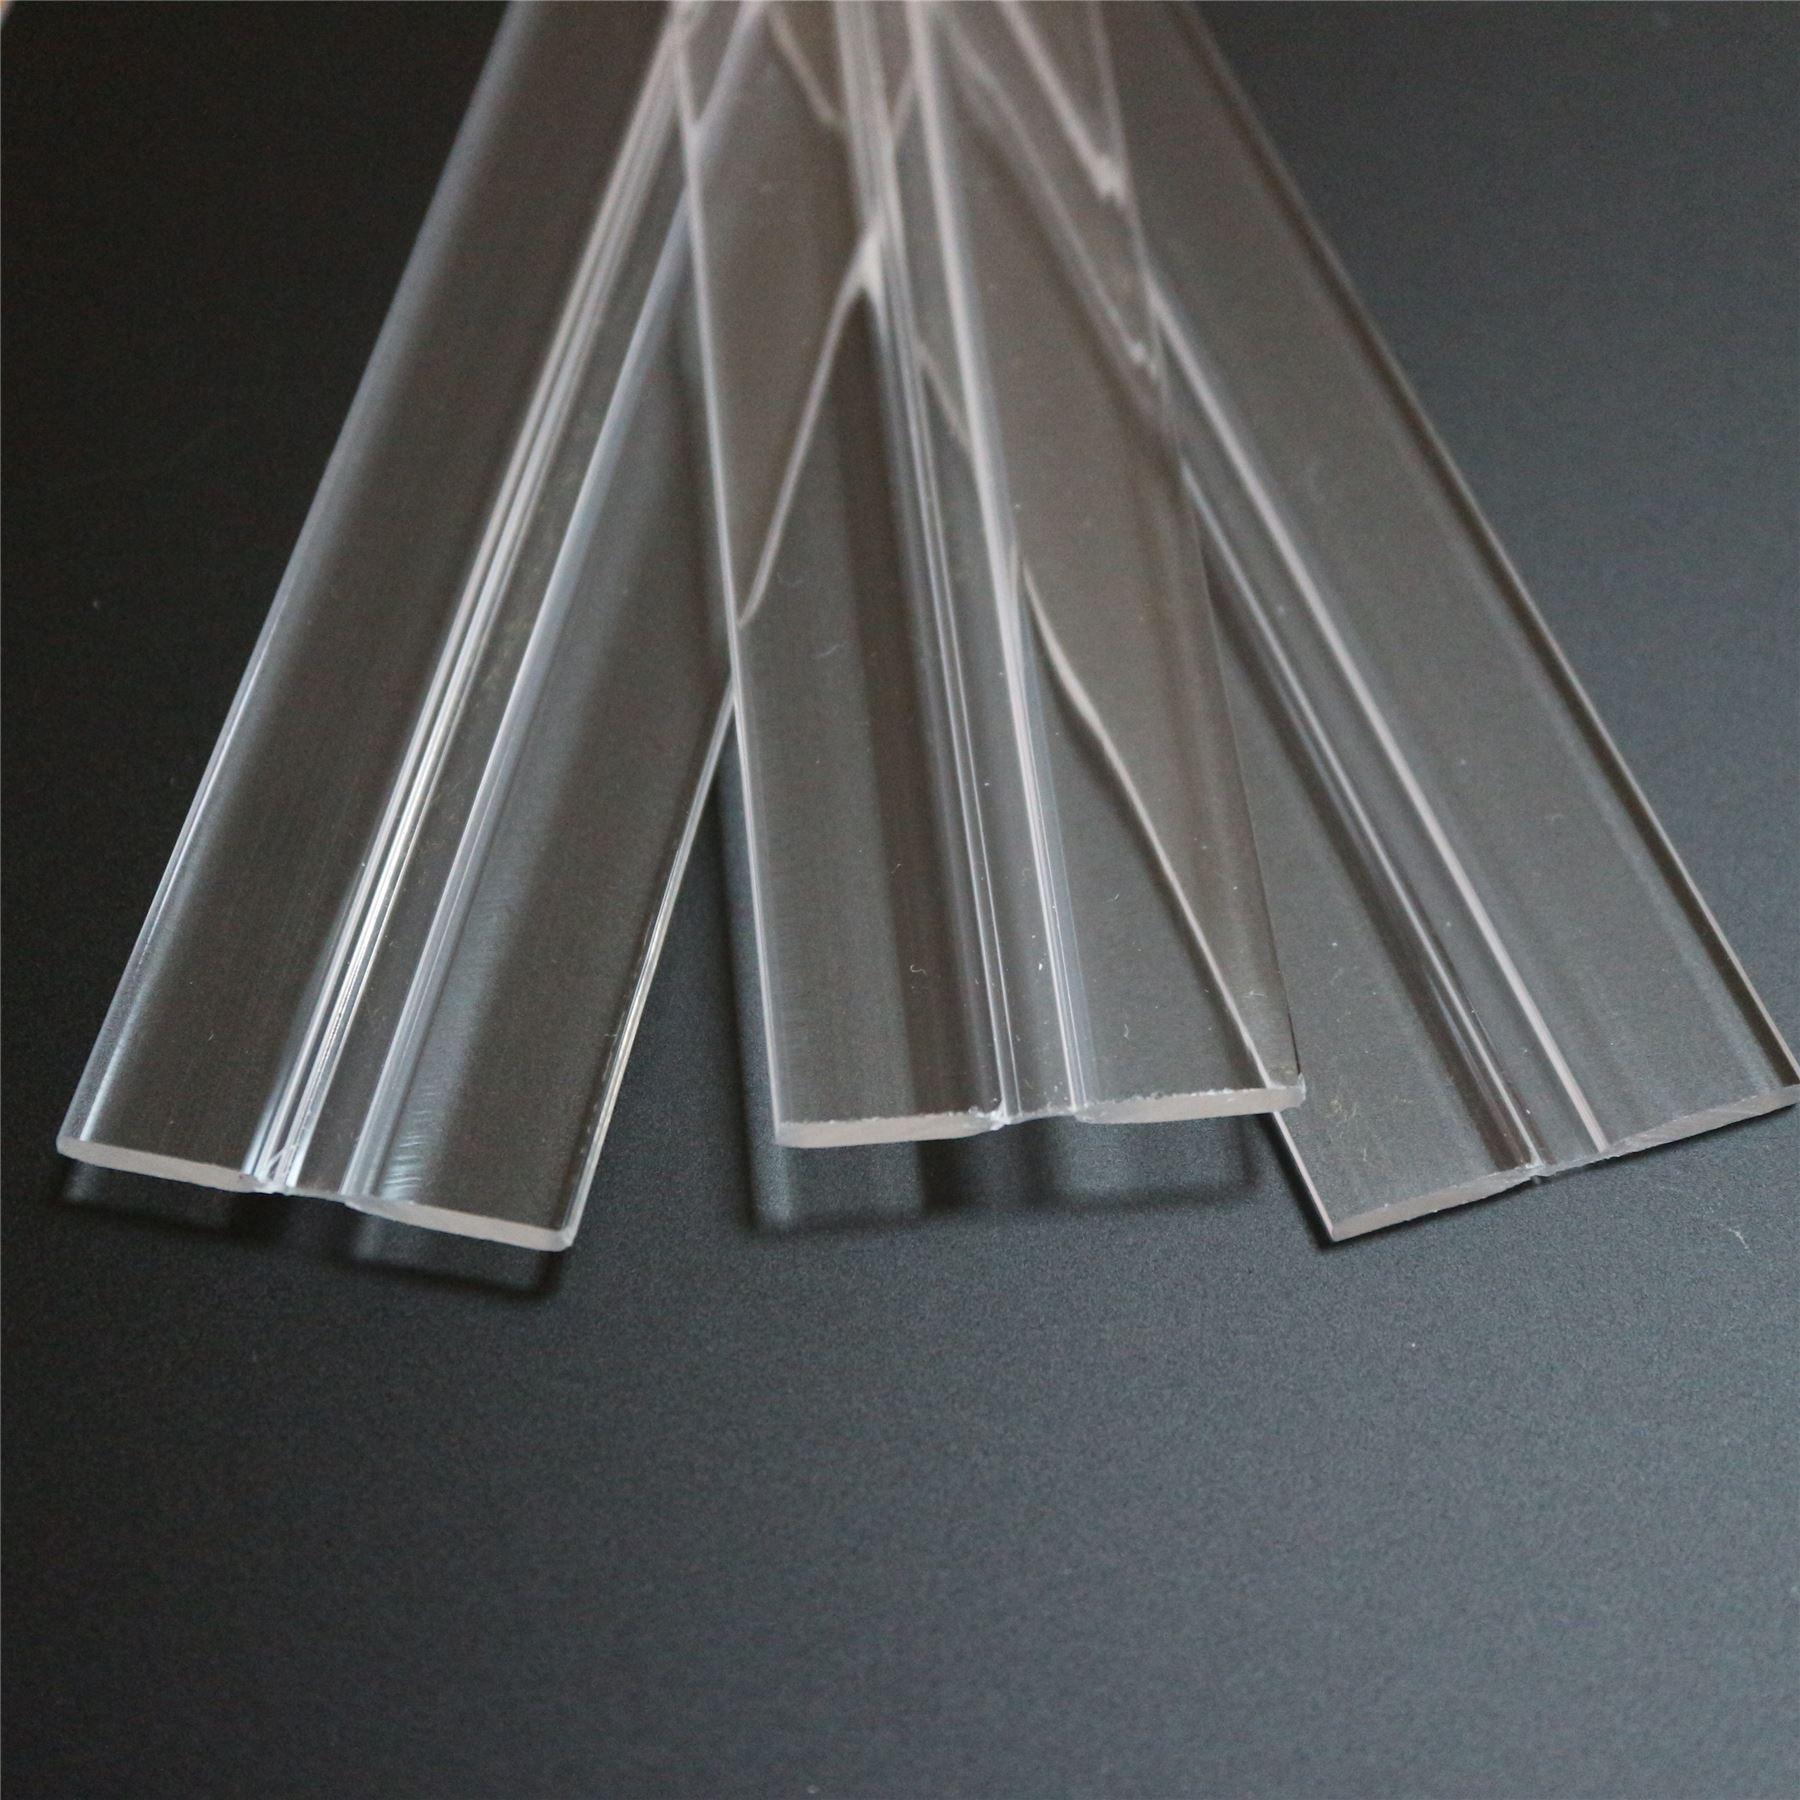 3 x 300mm low profile flex hinges, flexible living hinges,plexiglass ...